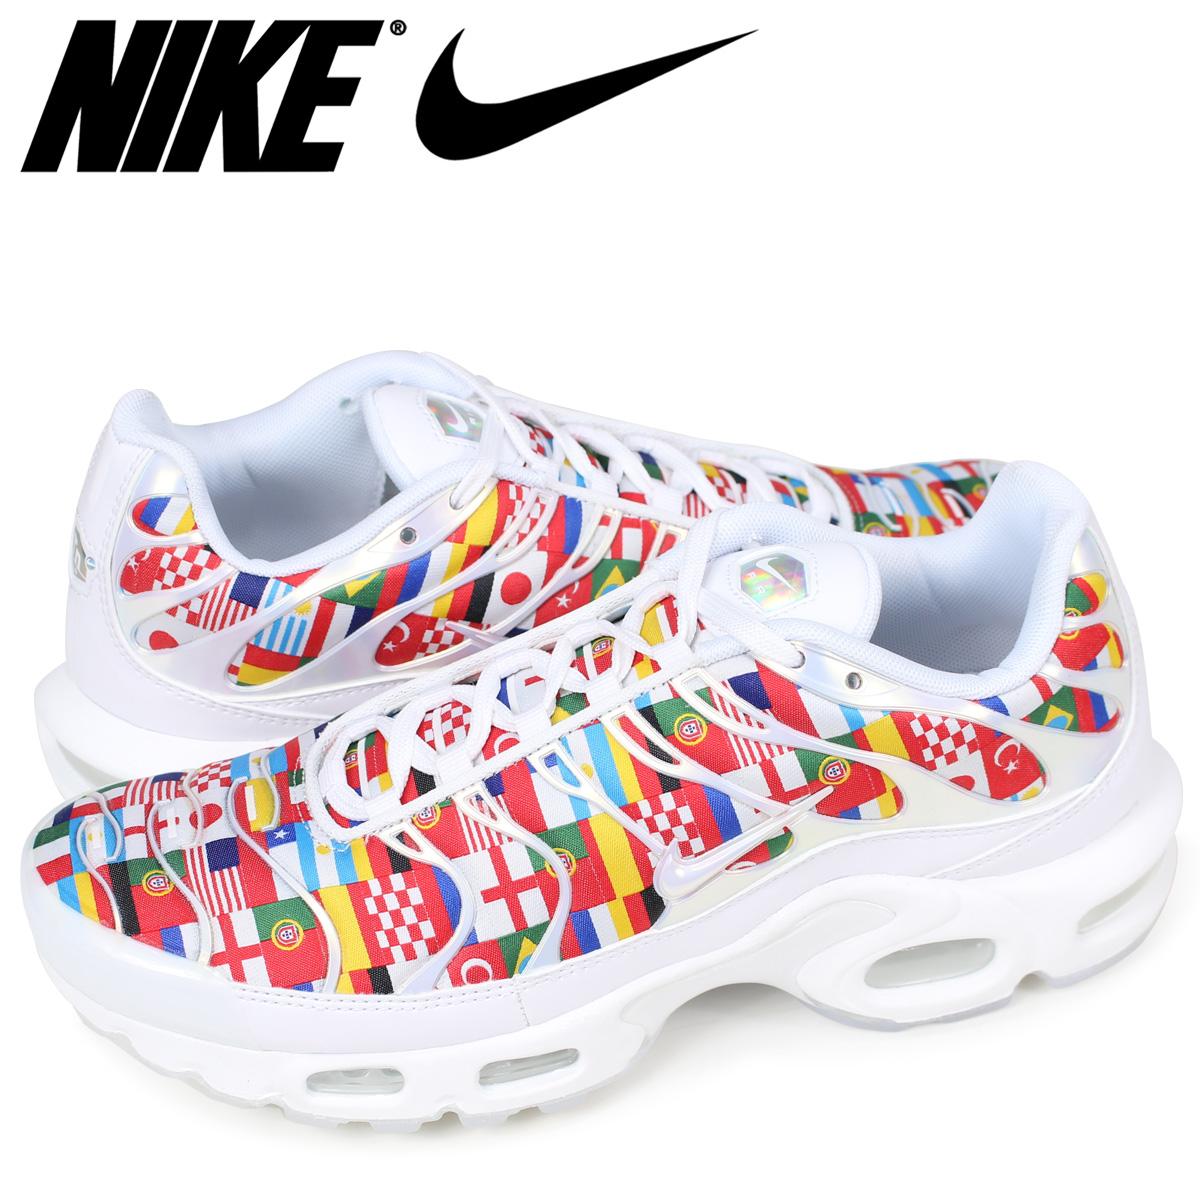 new arrival daafa 612f6 Nike NIKE Air Max plus sneakers men AIR MAX PLUS NIC QS AO5117-100 white